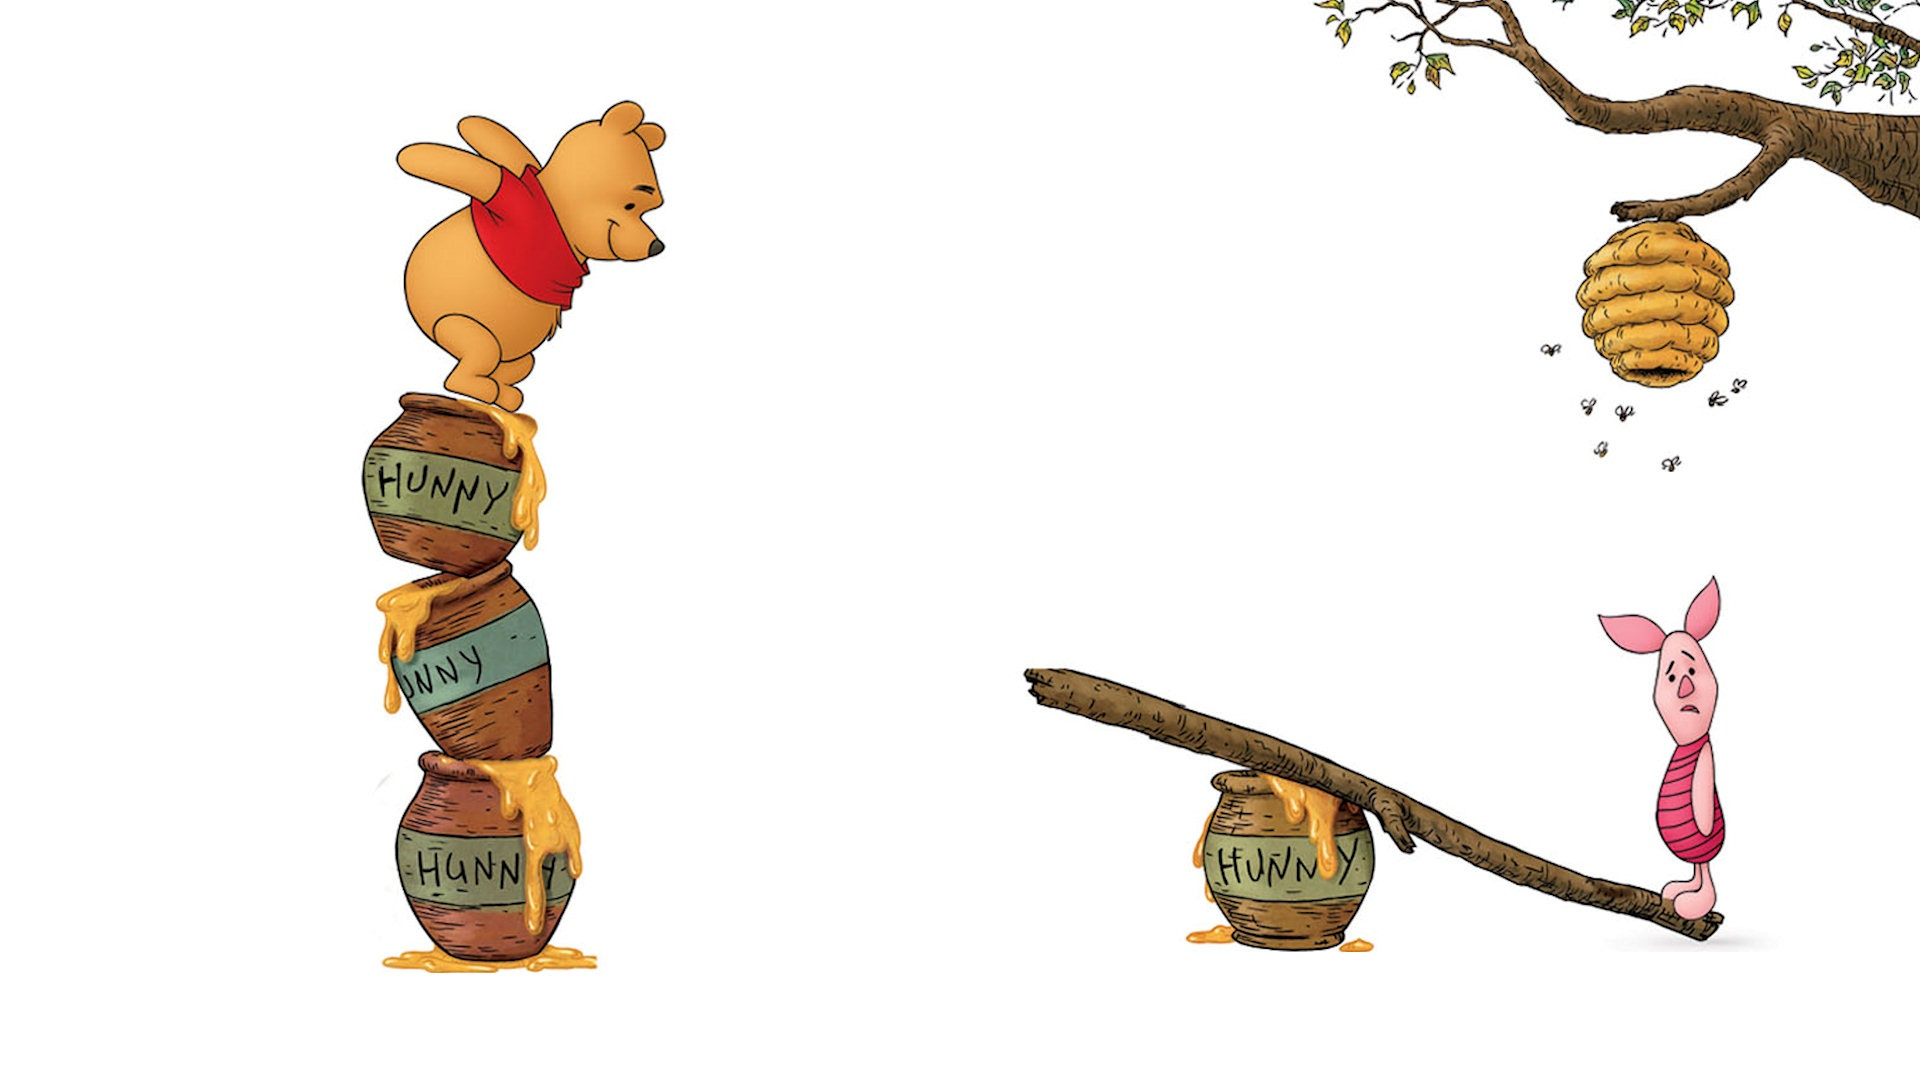 Classic Winnie The Pooh Wallpaper